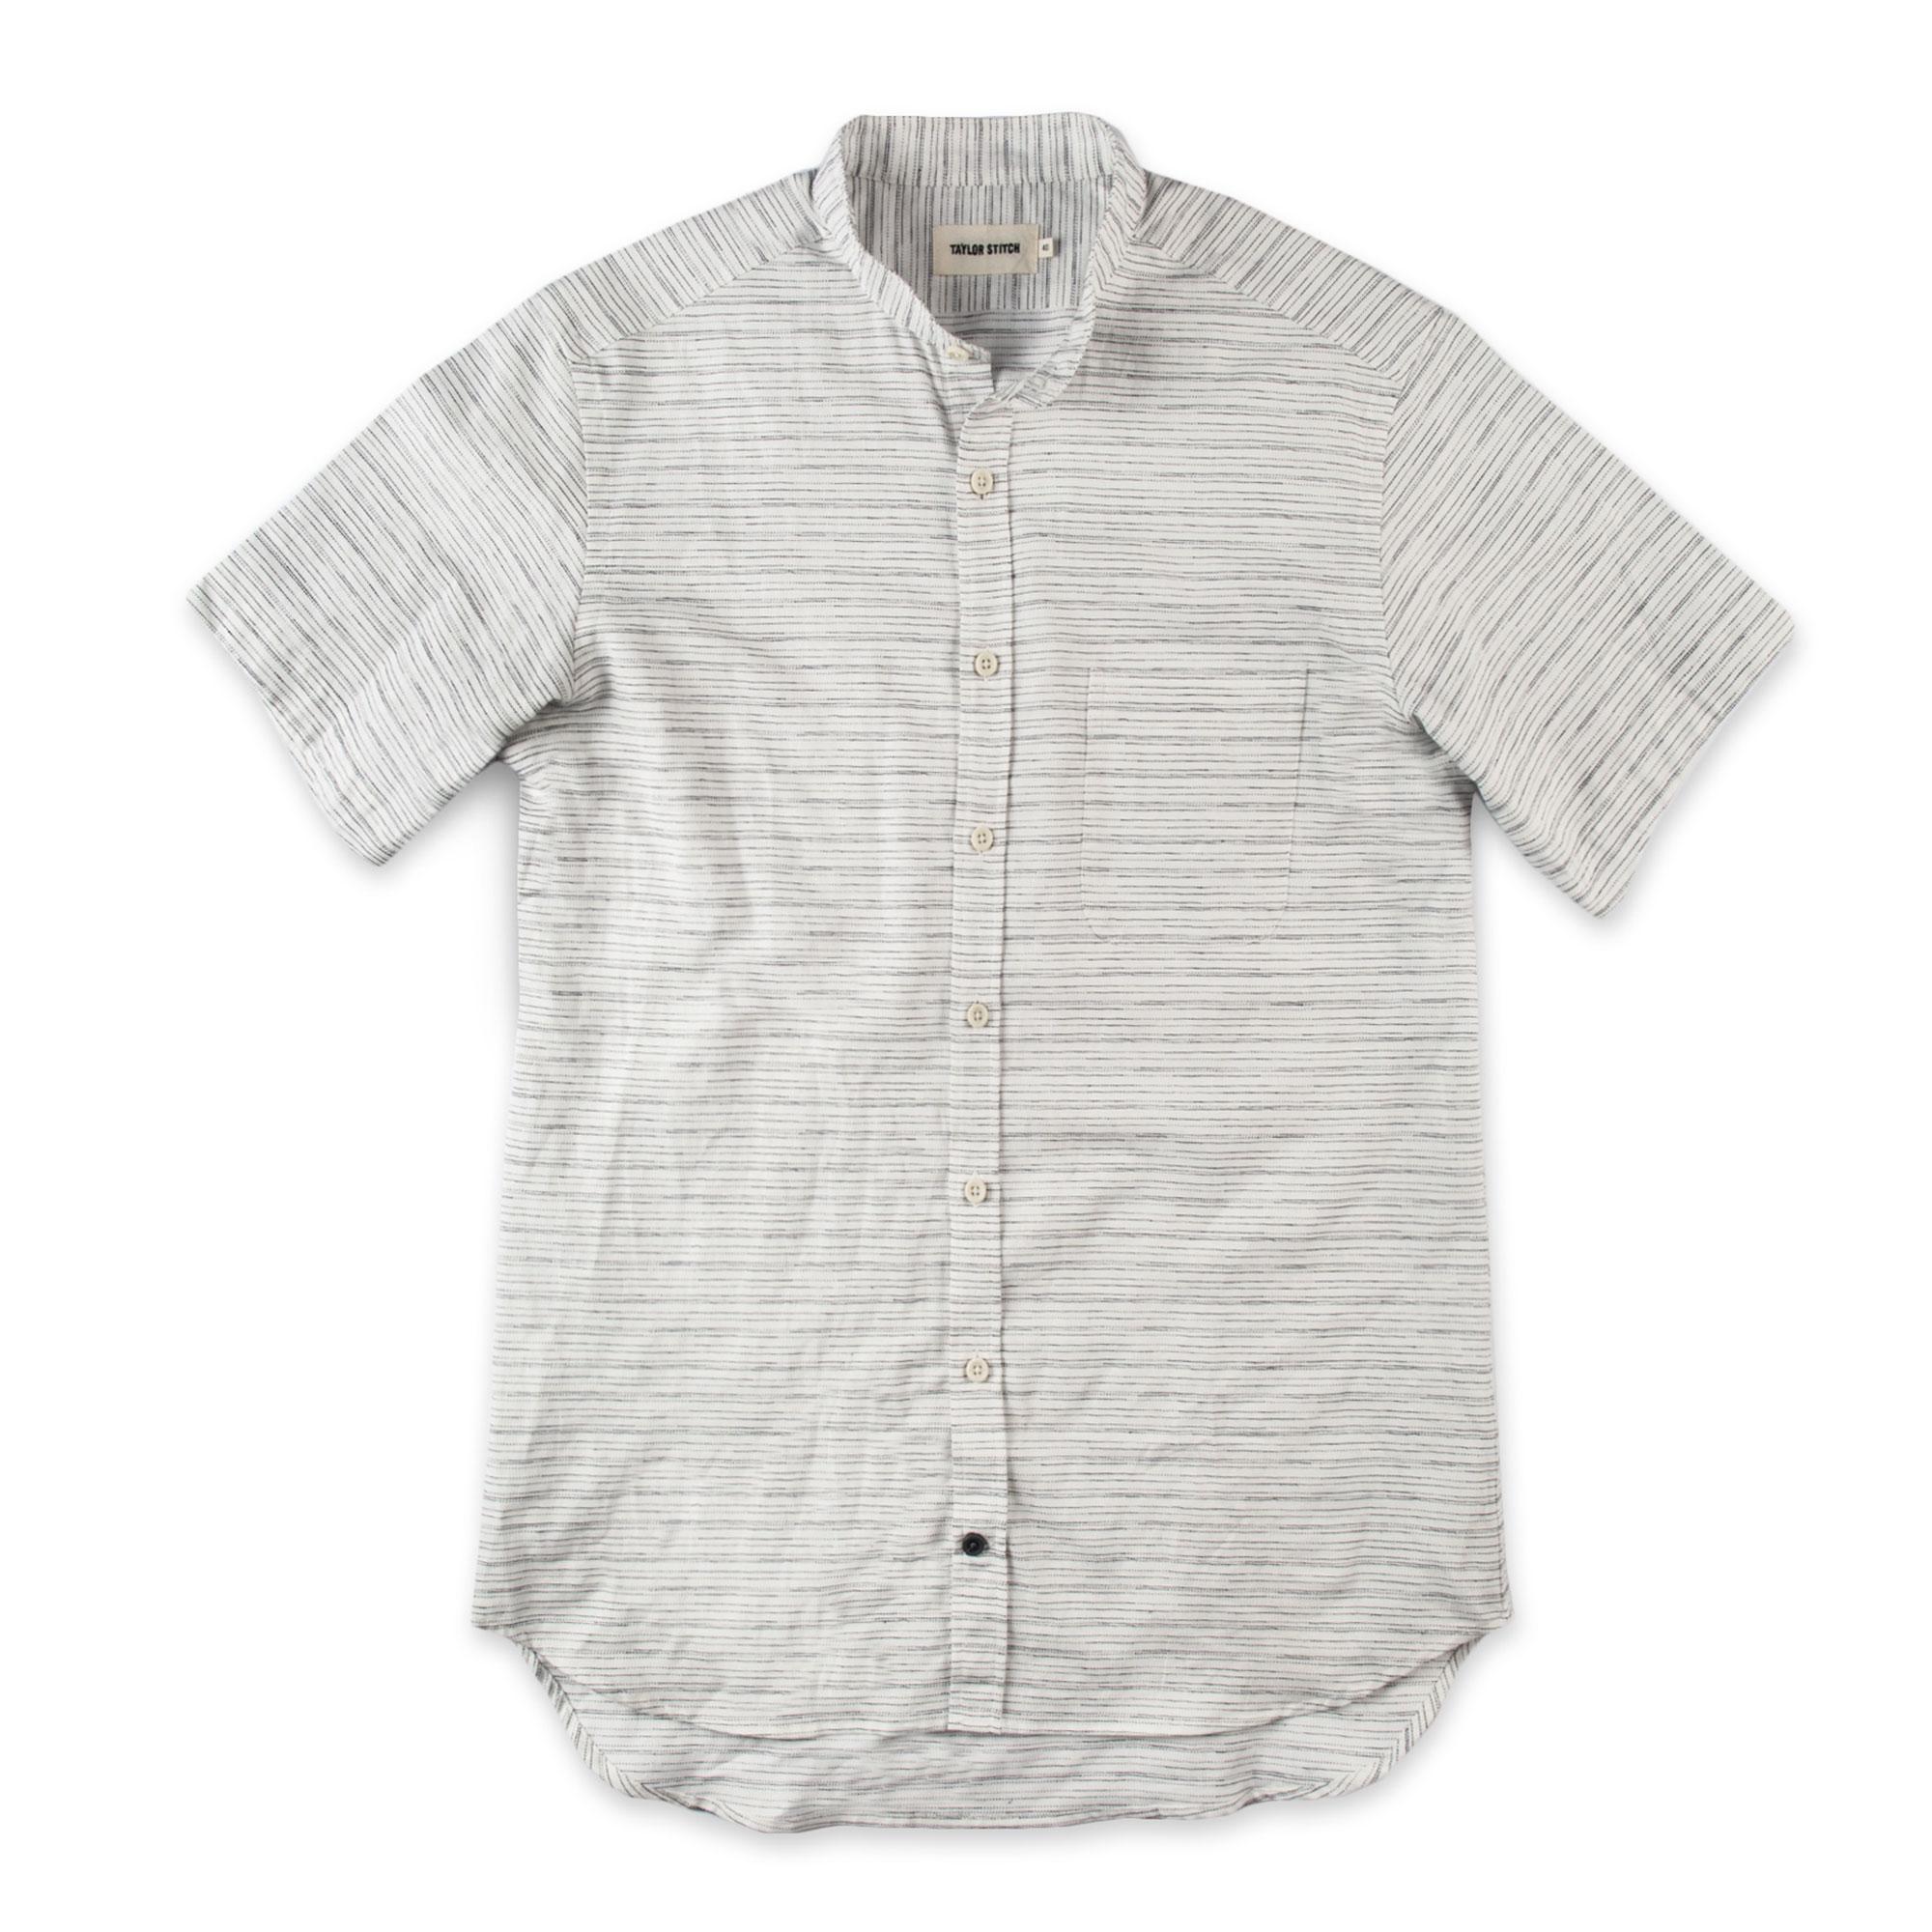 e2bf616d The Short Sleeve Bandit, White & Navy Slub Stripe | Bespoke Post